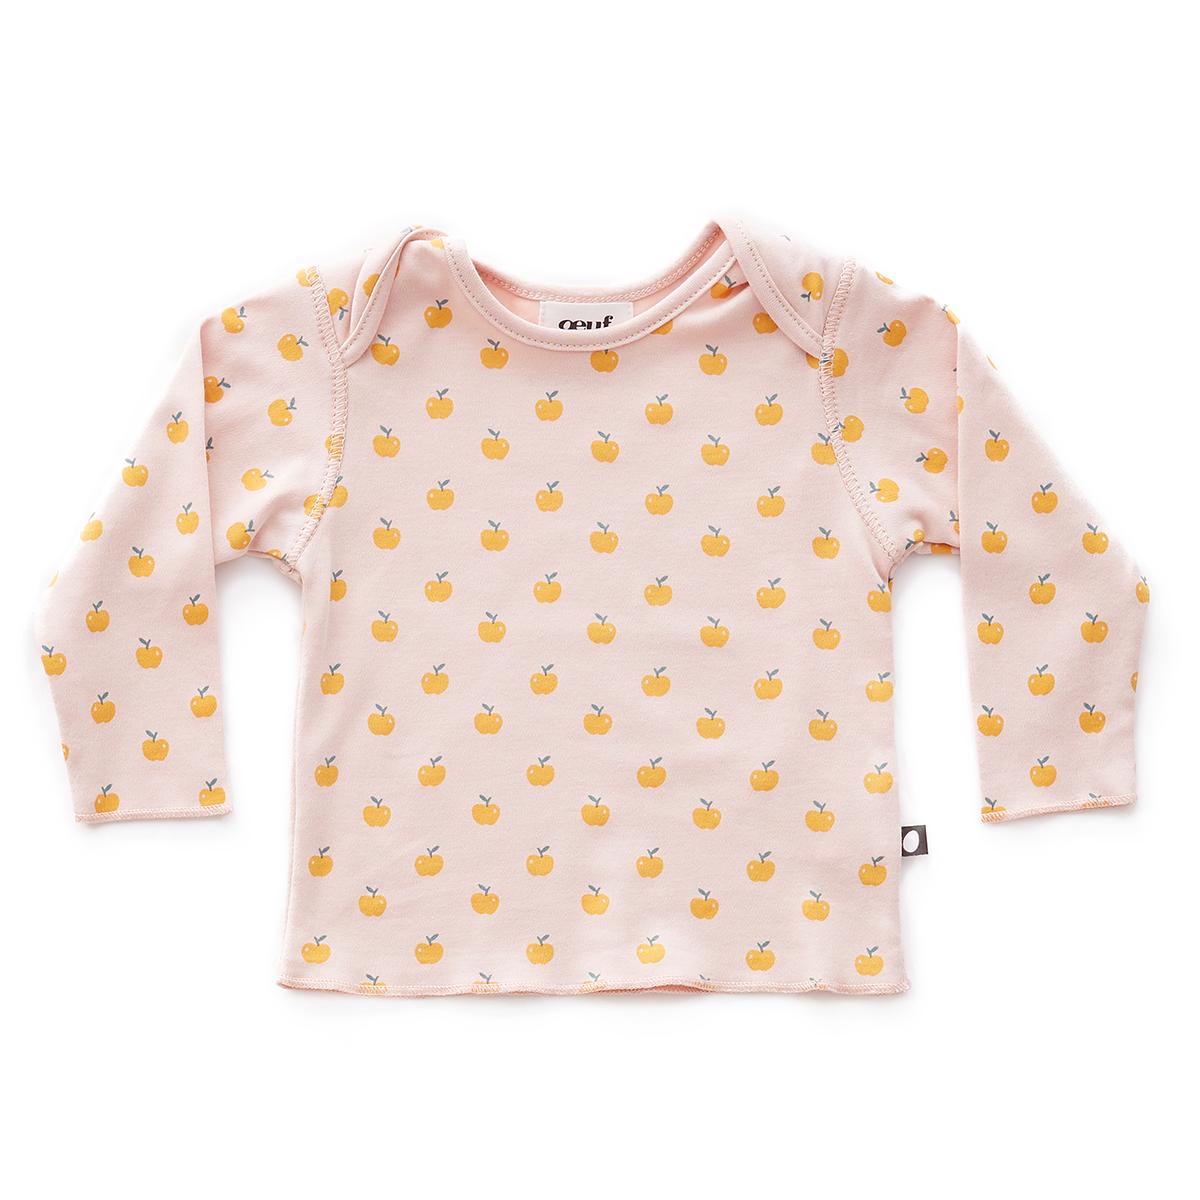 Hauts bébé Tee-shirt Pommes Rose - 6 Mois Tee-shirt Pommes Rose - 6 Mois